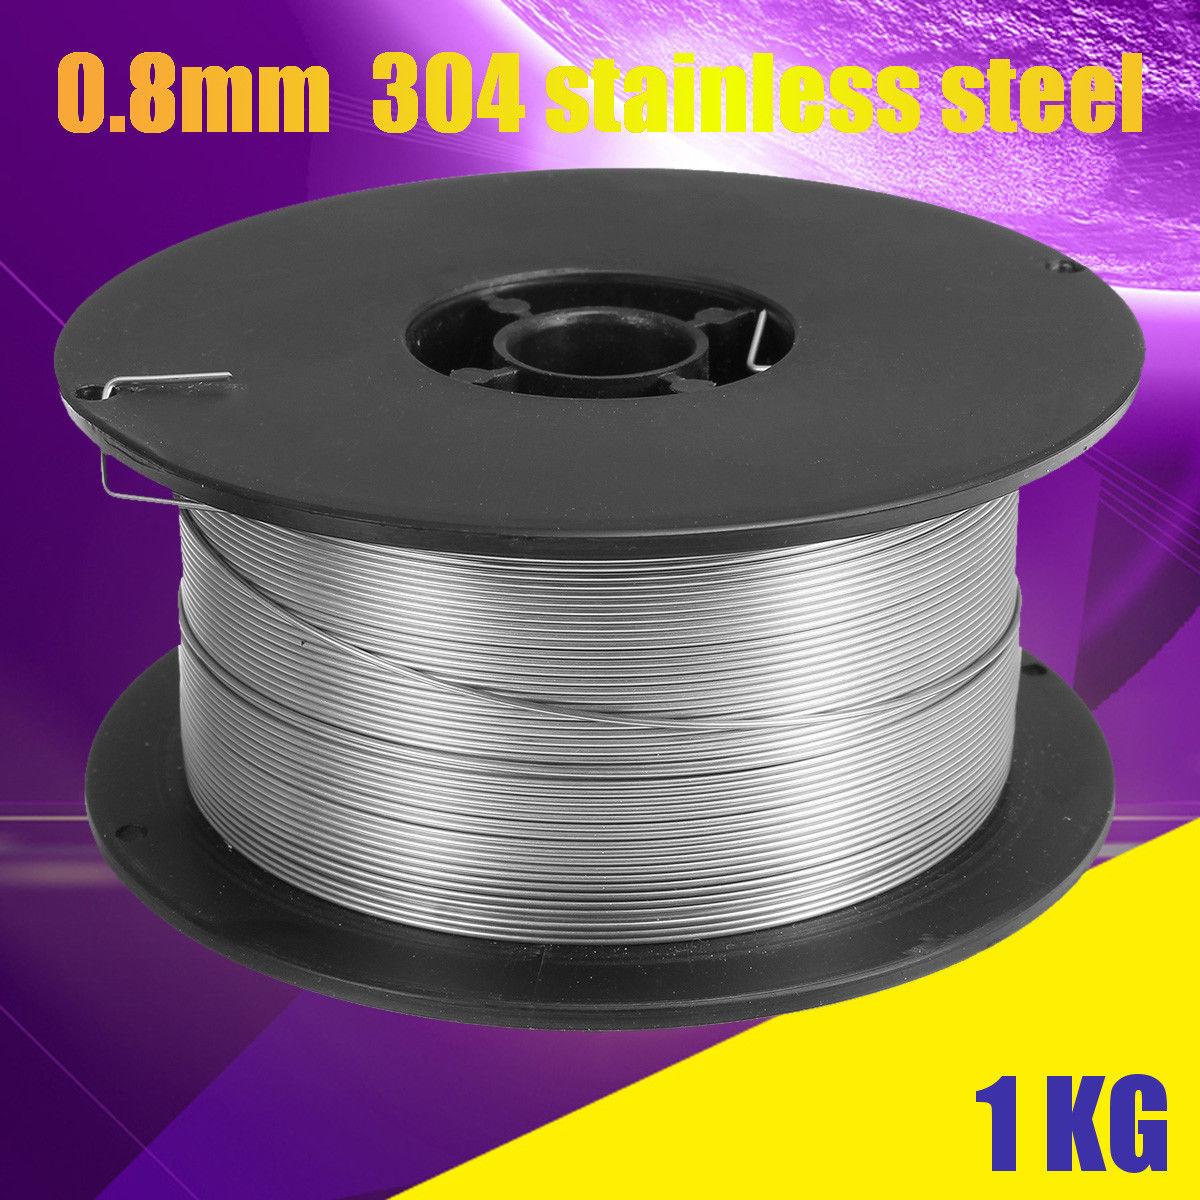 Flux Core Welding Wire >> Details About 1kg 0 8mm Stainless Steel Gasless Mig Welding Wire Flux Cored Welding Equipment